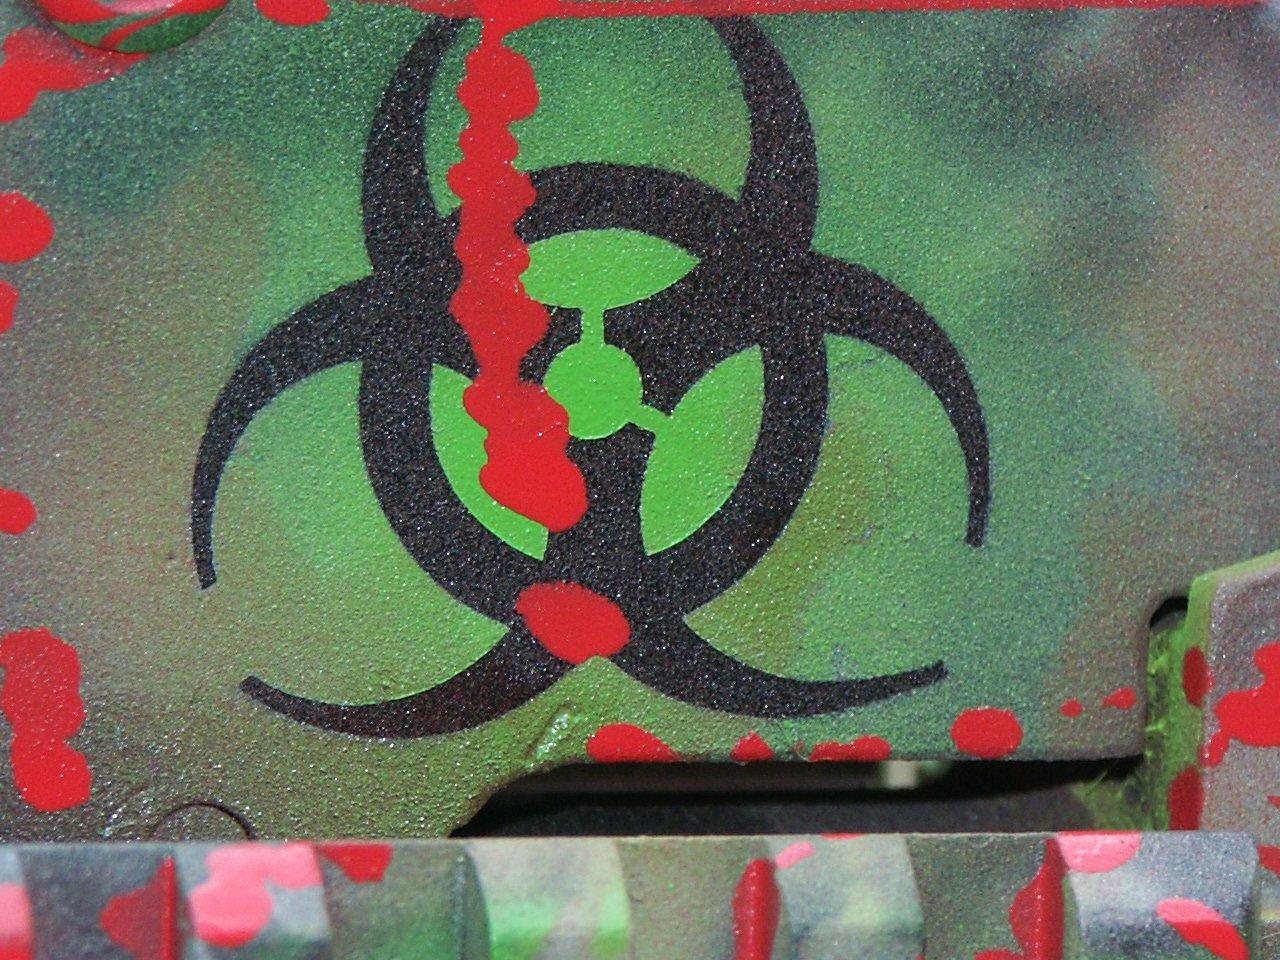 Biohazard coating